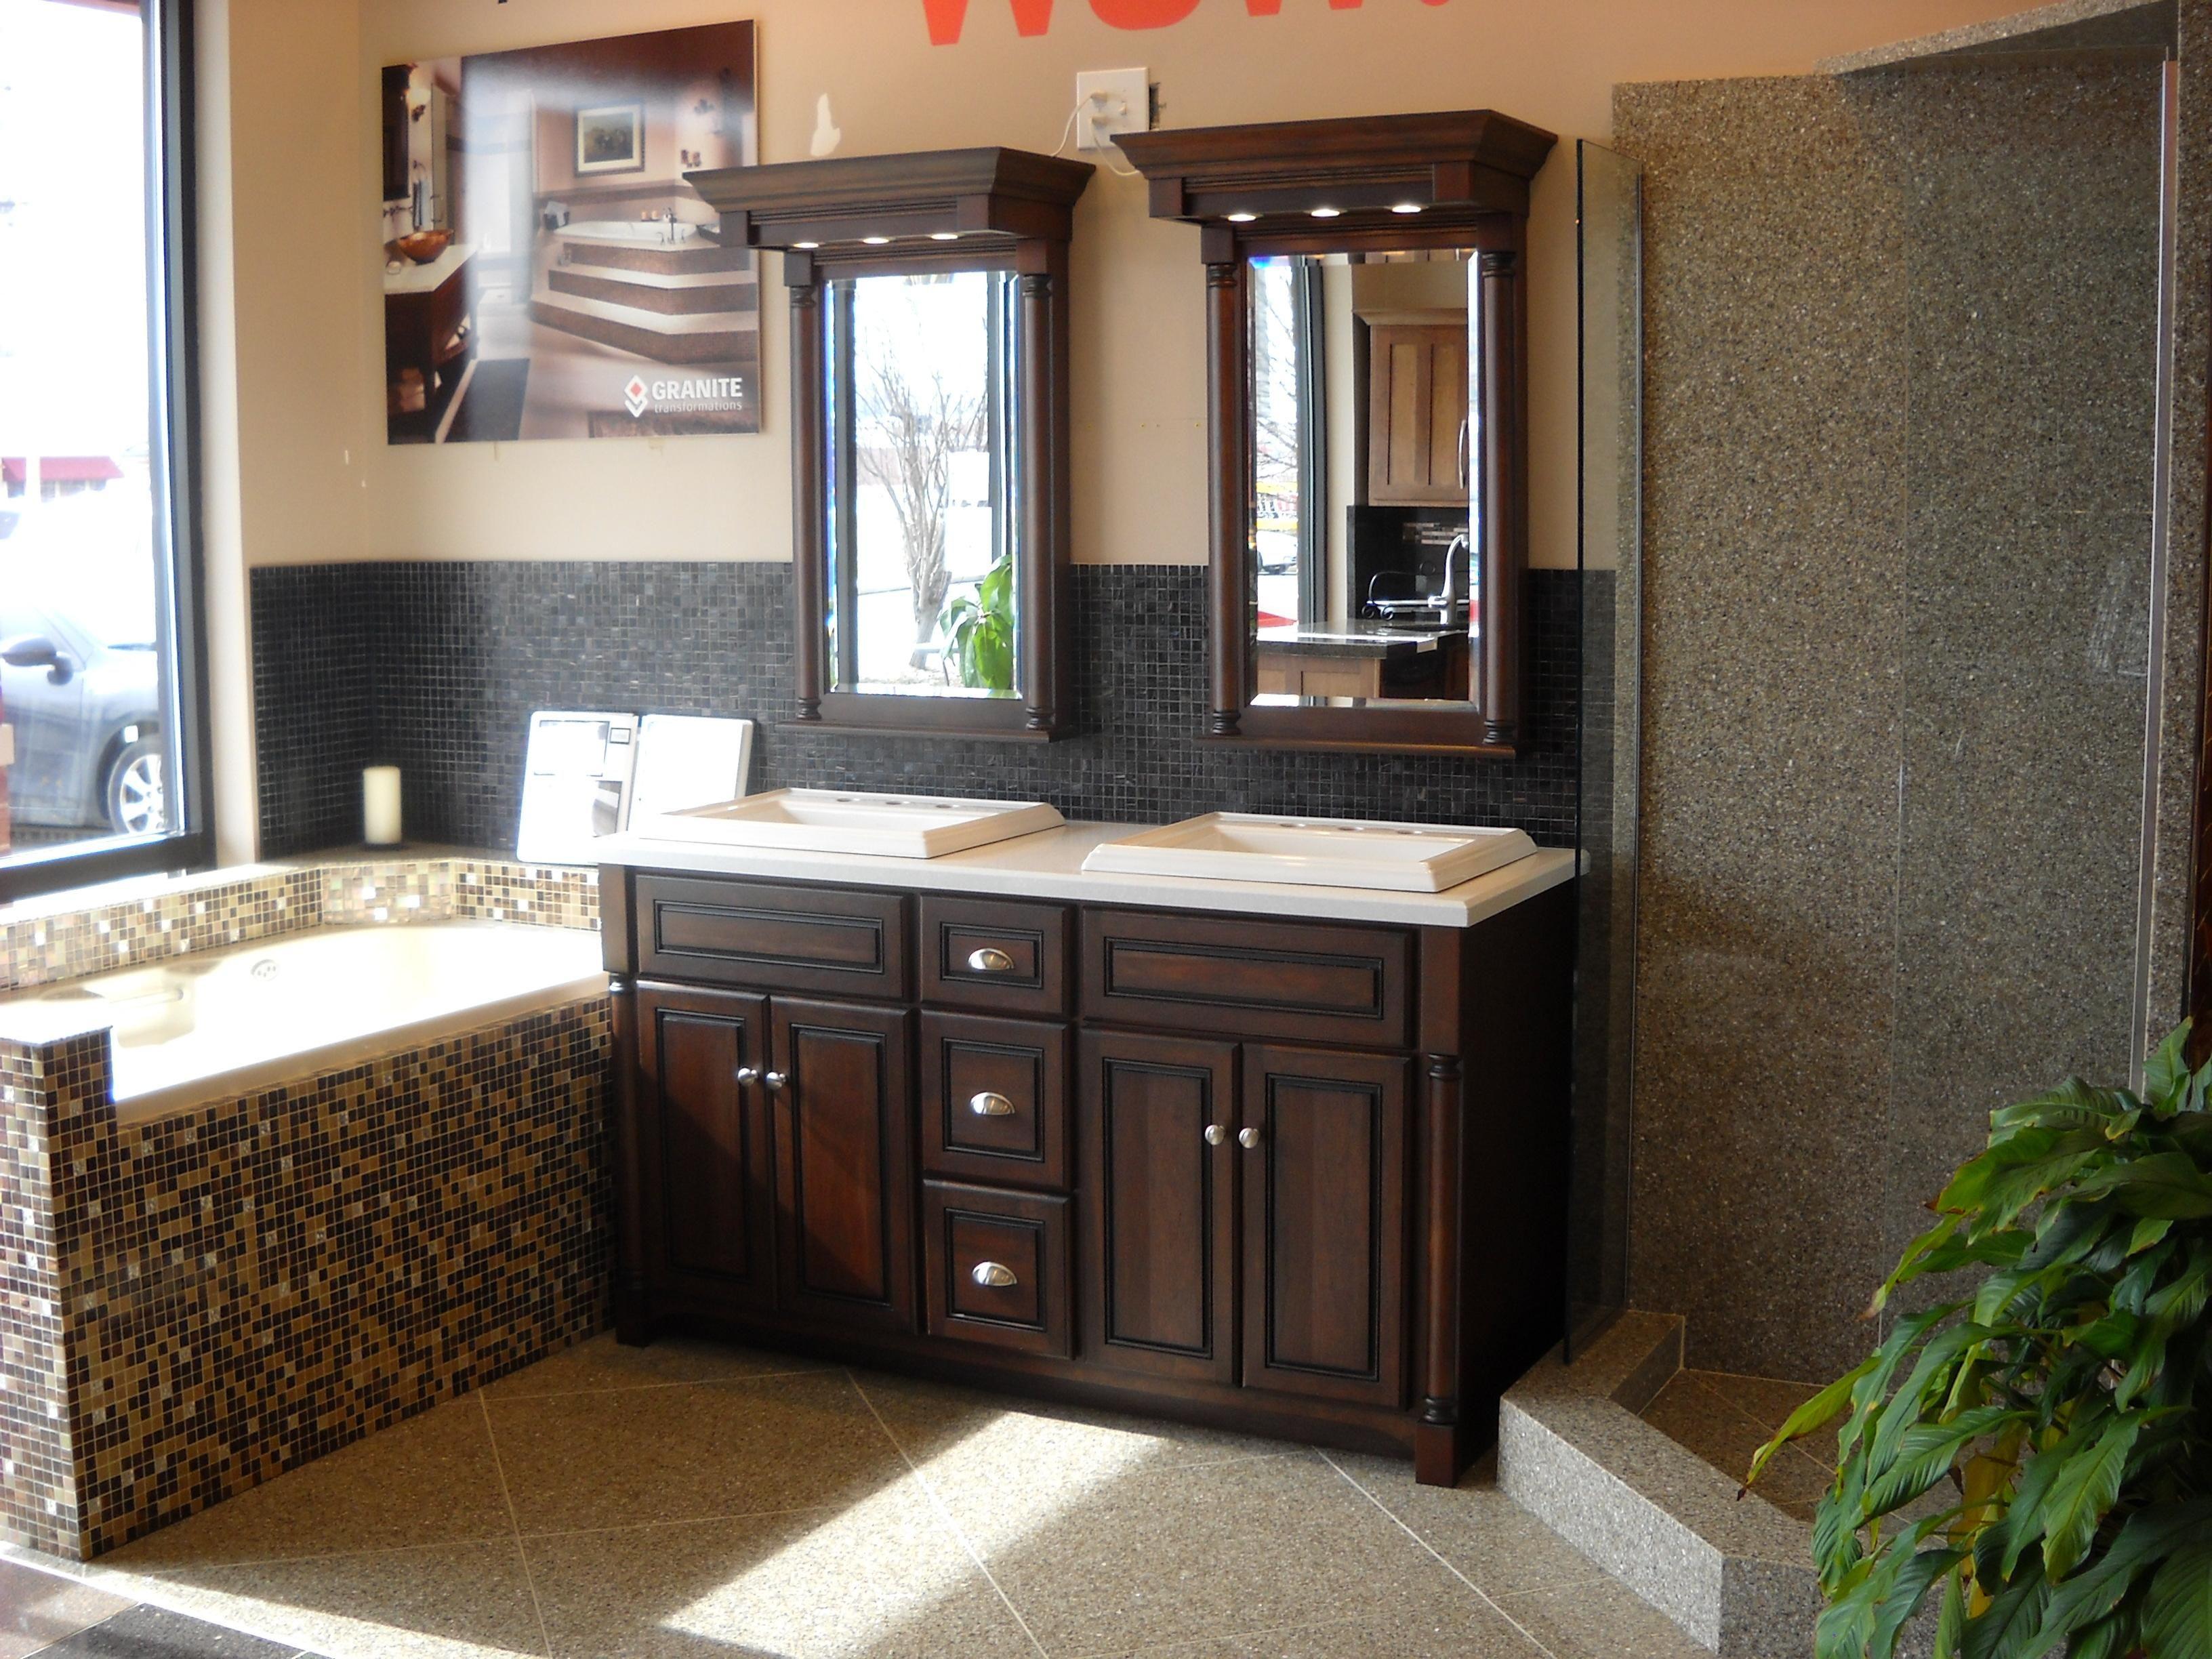 Interesting Transitional His Hers Bathroom Setup Bathroom Transformation Elegant Bathroom Granite Vanity Countertops